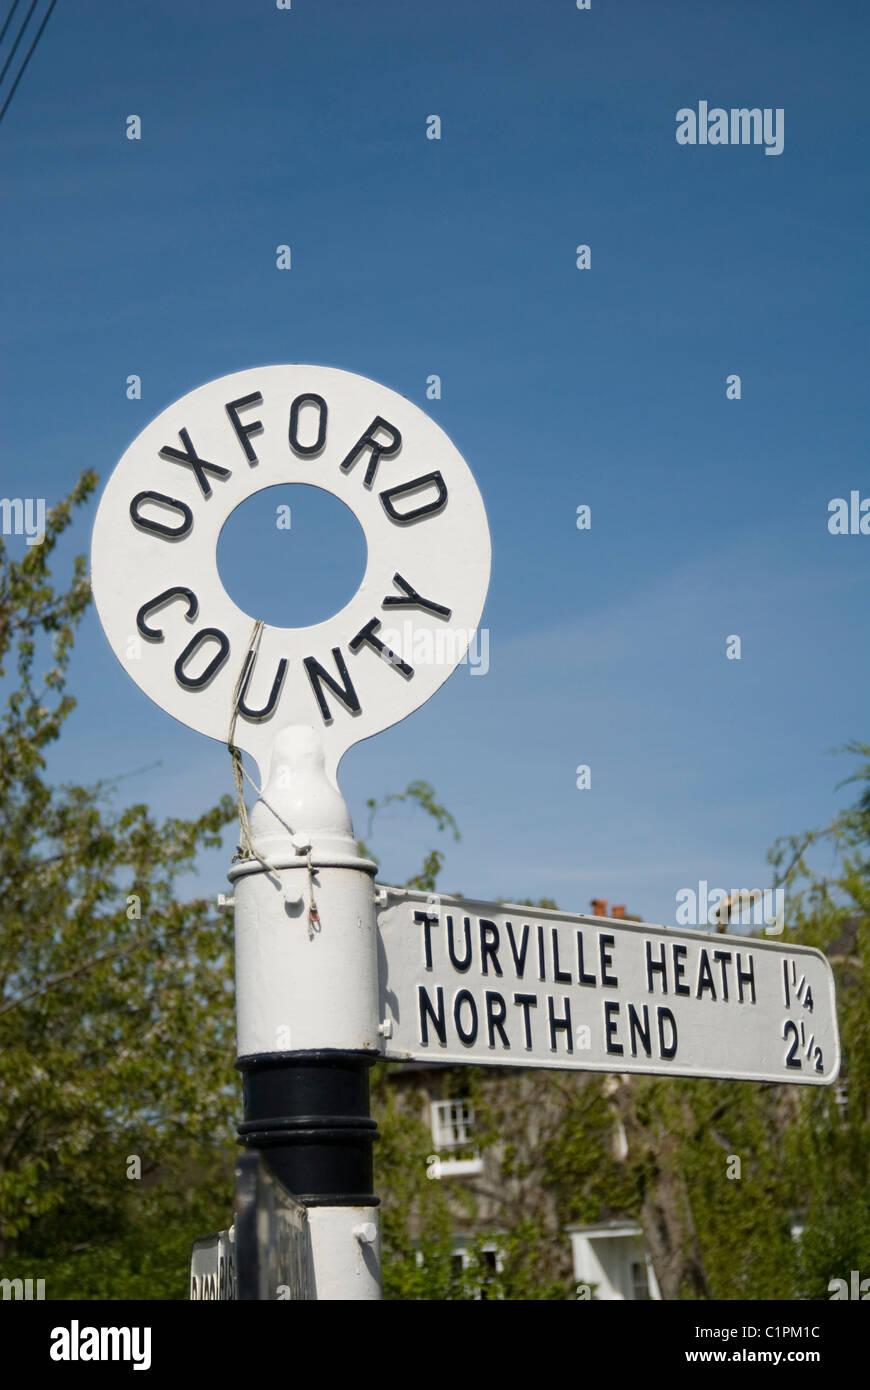 UK, England, Chilterns, road sign - Stock Image